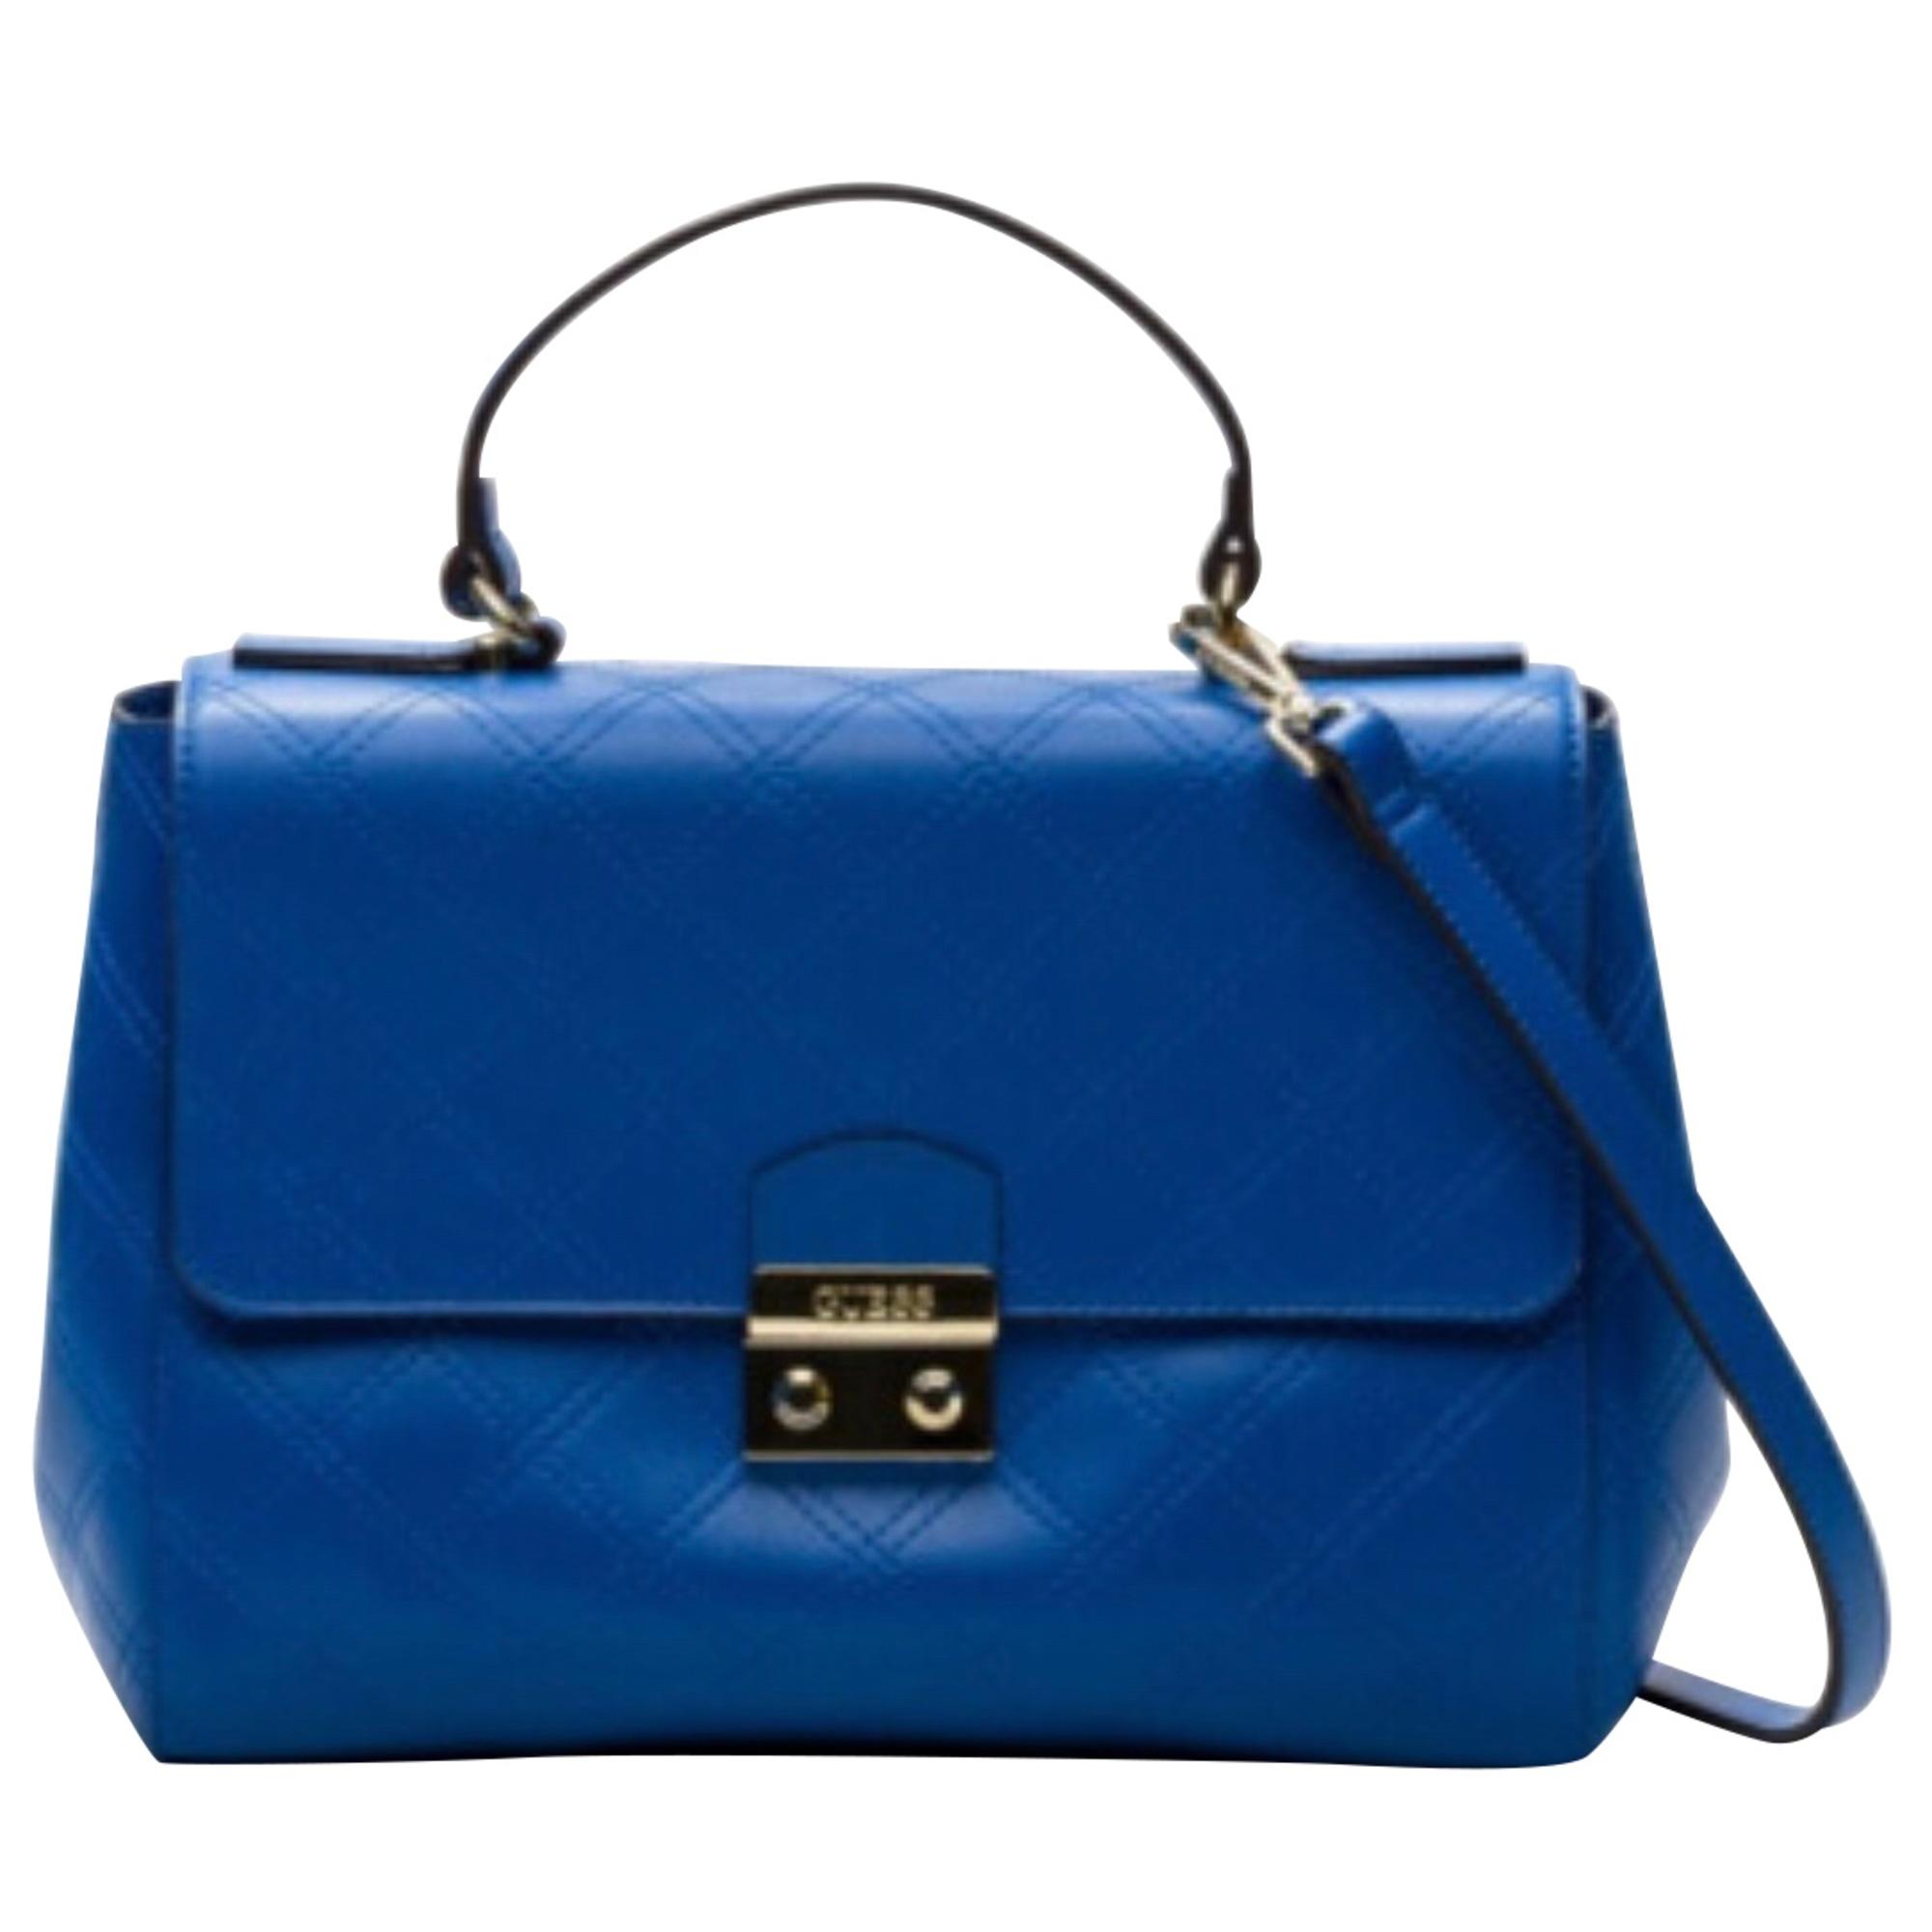 Sac à main en cuir GUESS Bleu, bleu marine, bleu turquoise